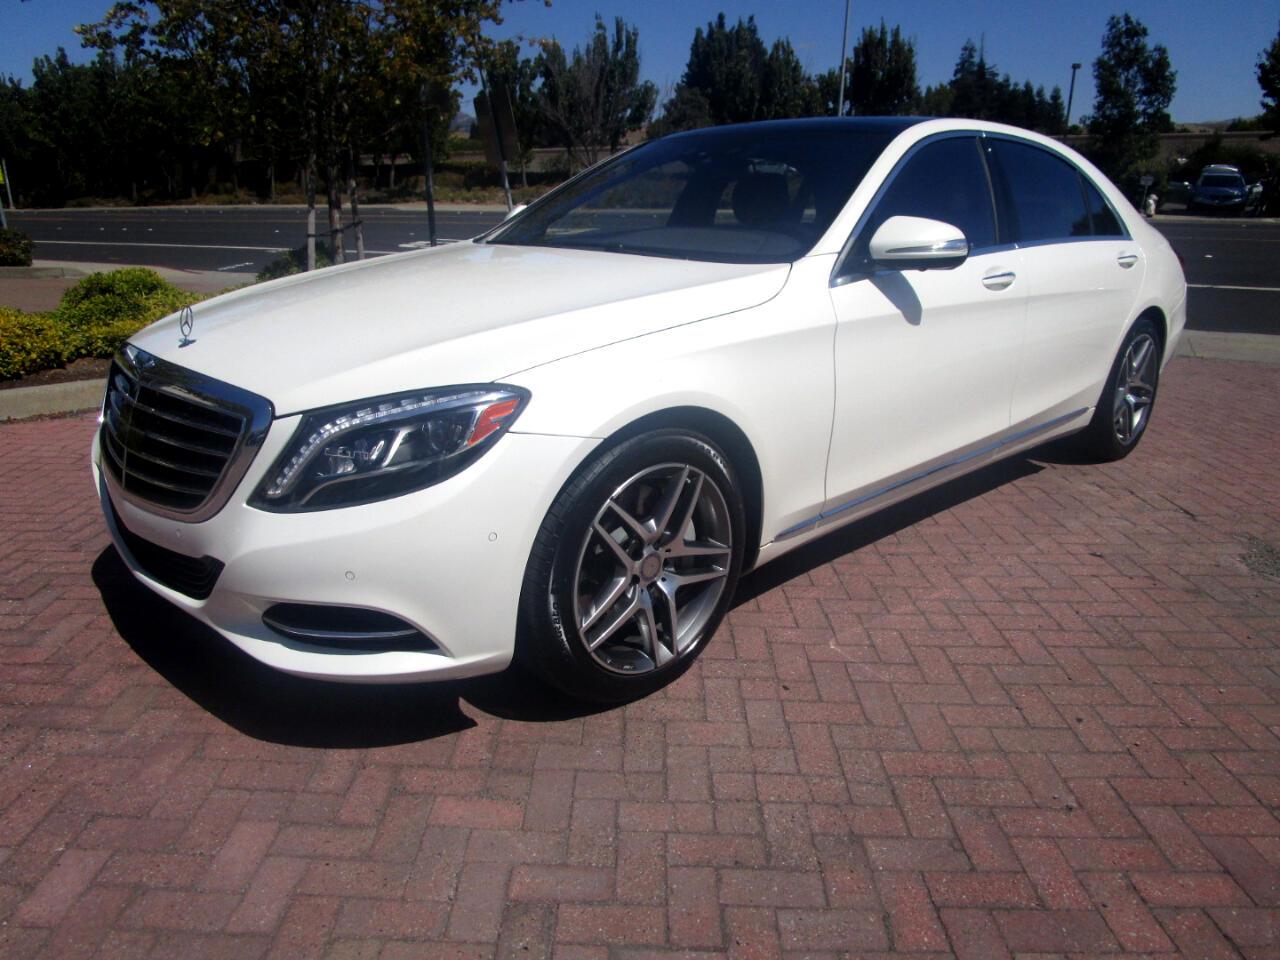 2016 Mercedes-Benz S550 TWIN TURBO V8*FULL DRIVER ASSIST**DYNAMIC HEAT/AC